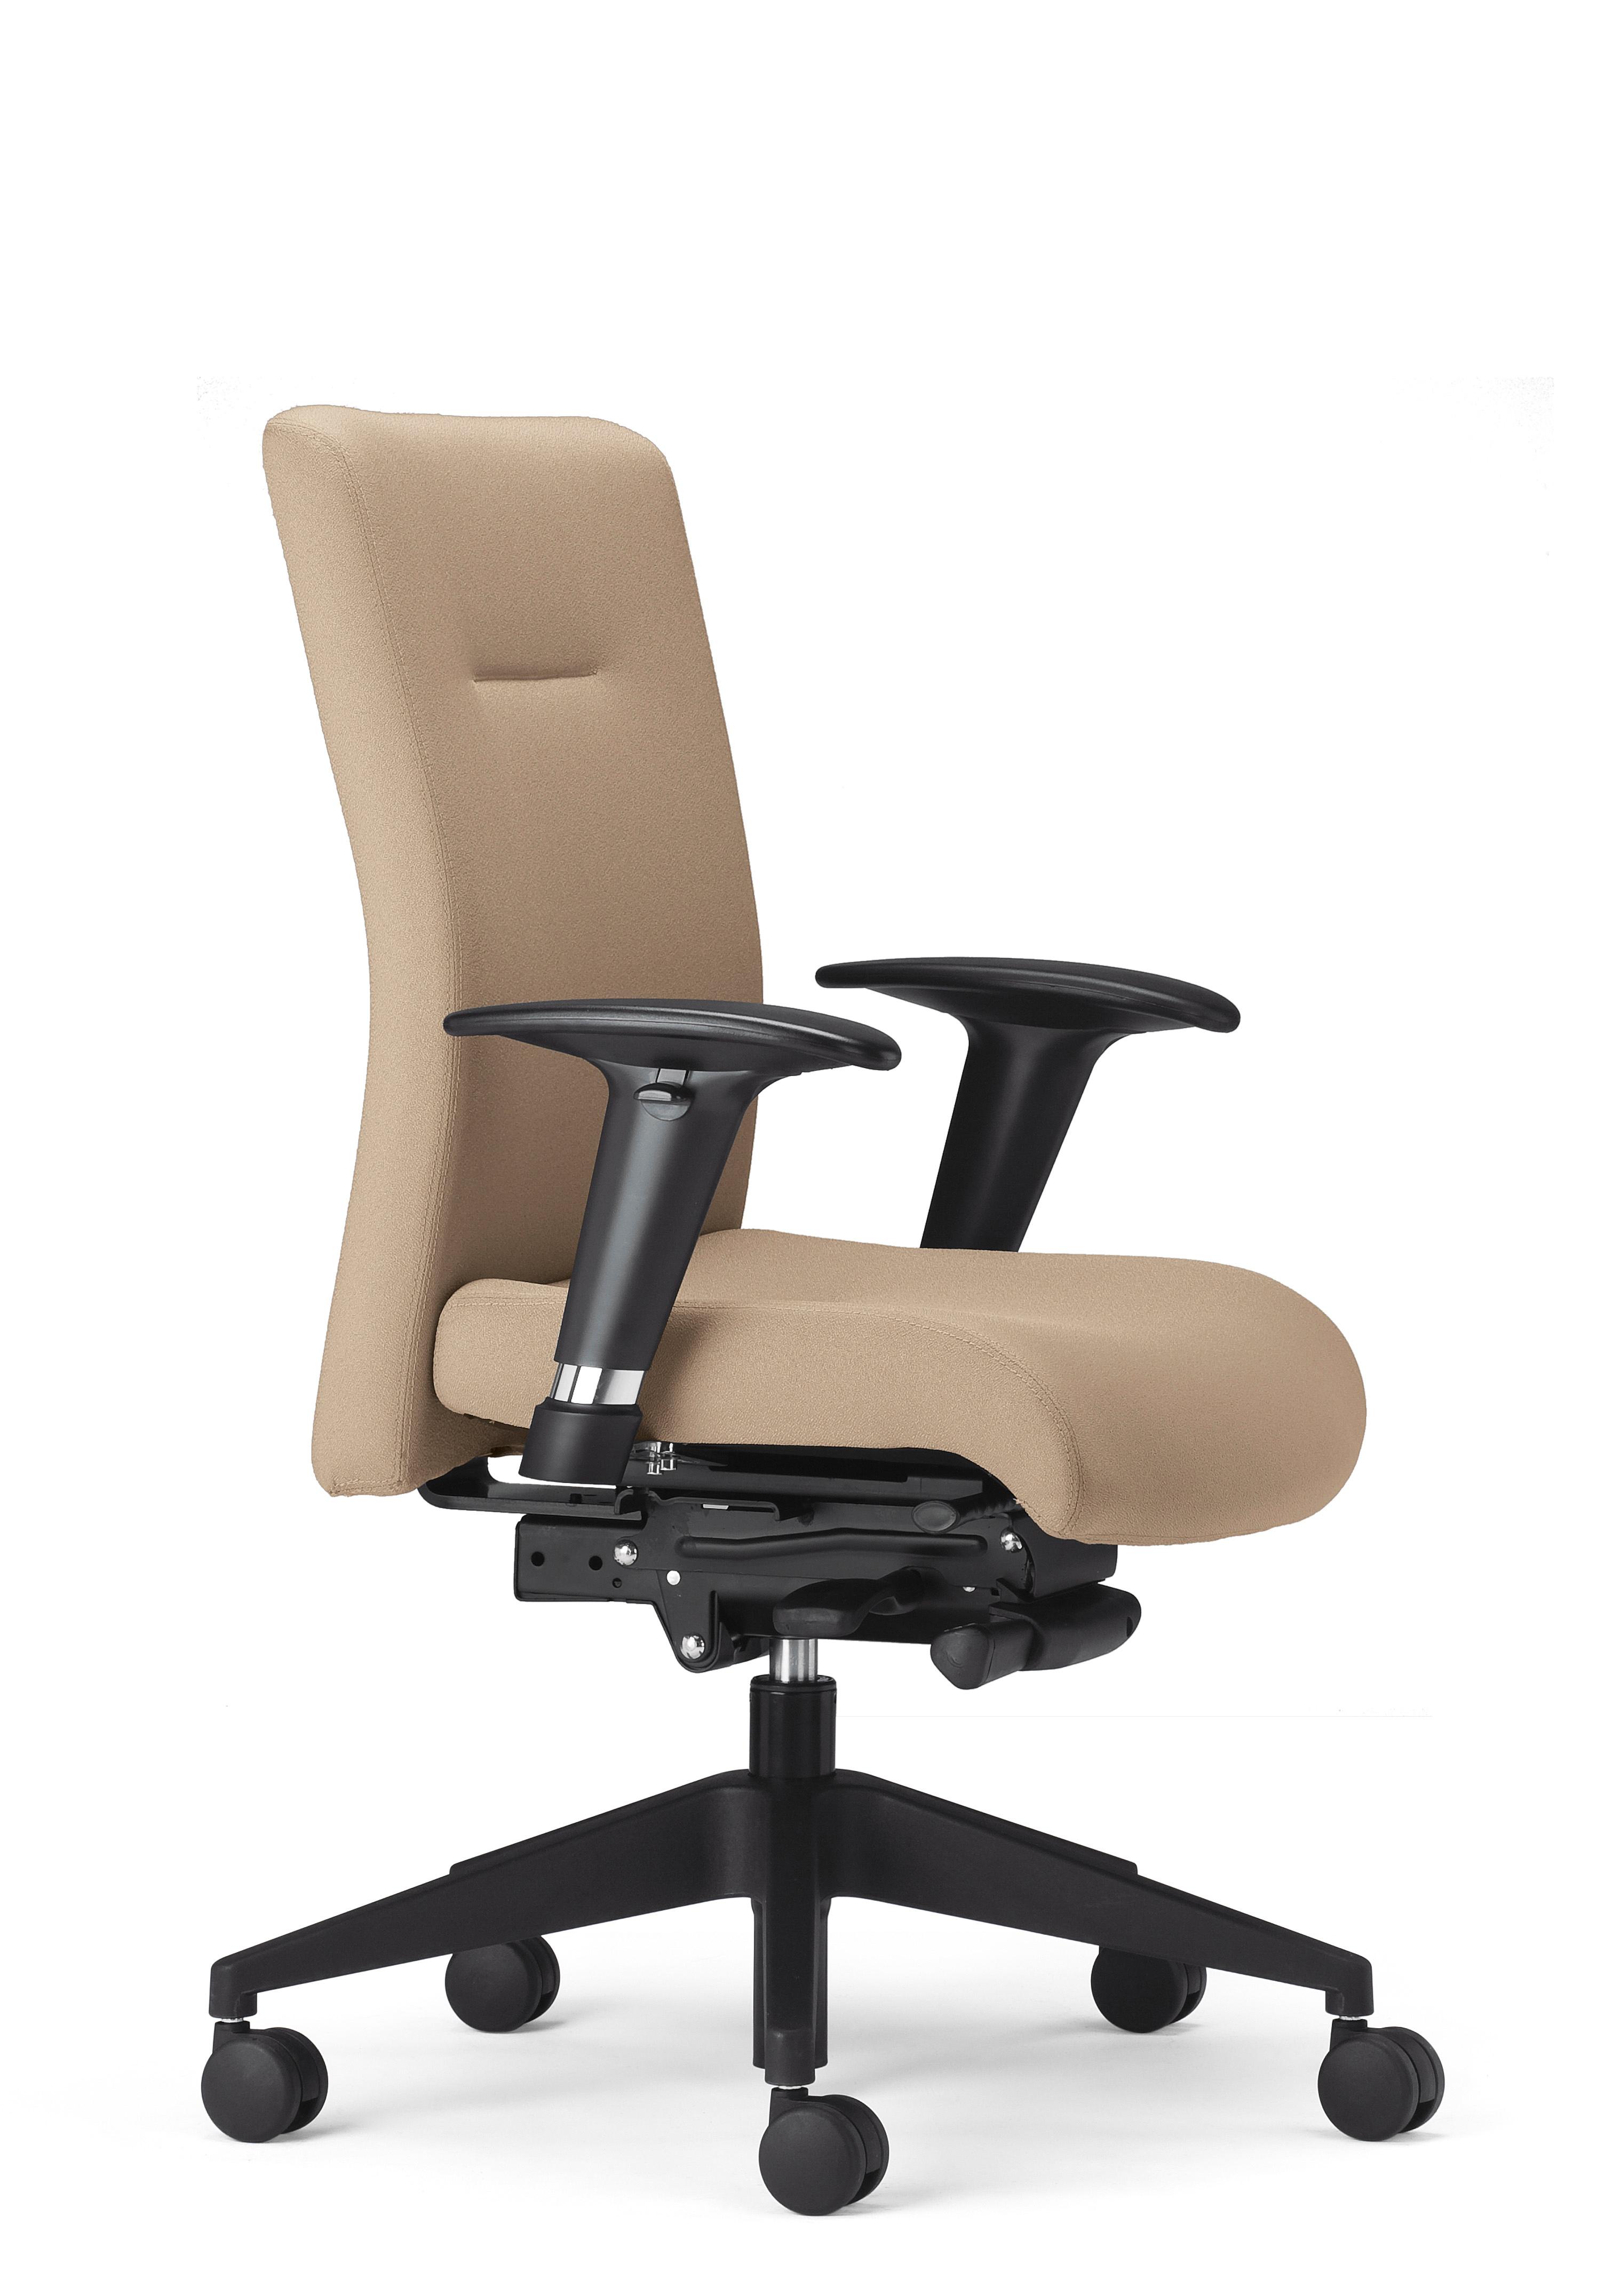 art-office-shop-rovo-chair-xp-4010-s1_quer_beige